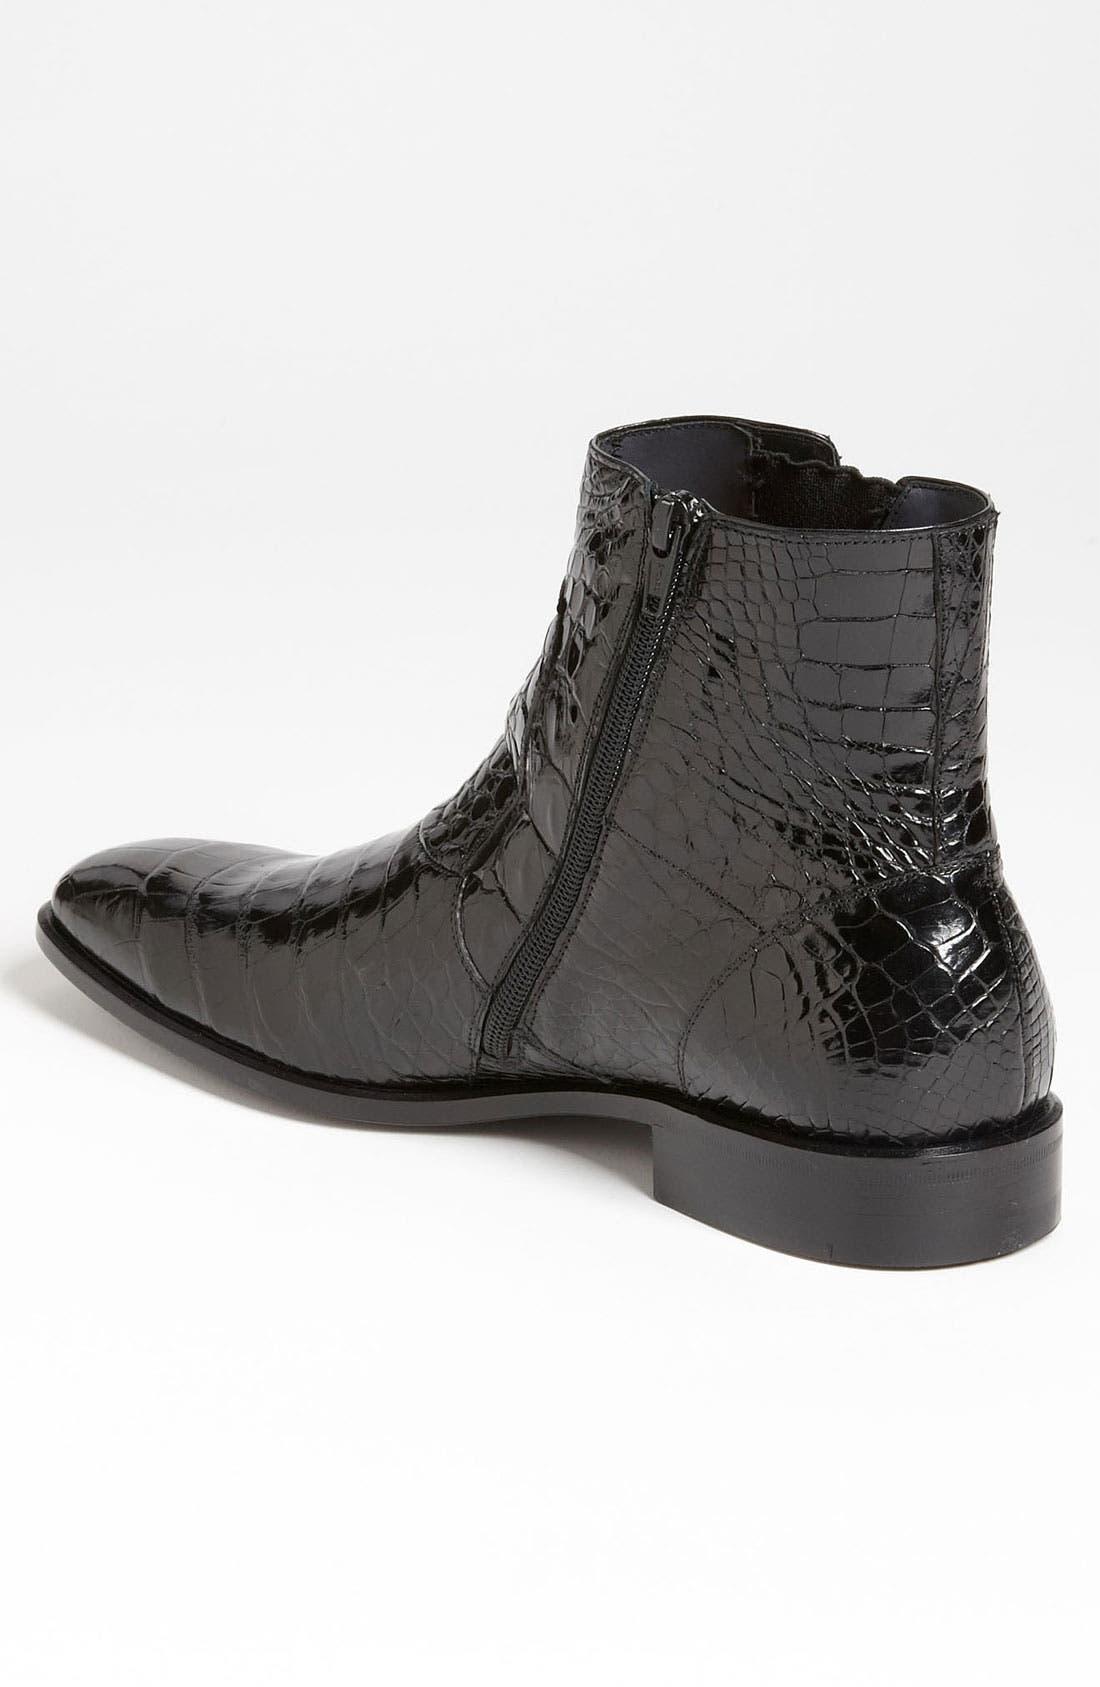 'Belucci' Alligator Boot,                             Alternate thumbnail 4, color,                             001